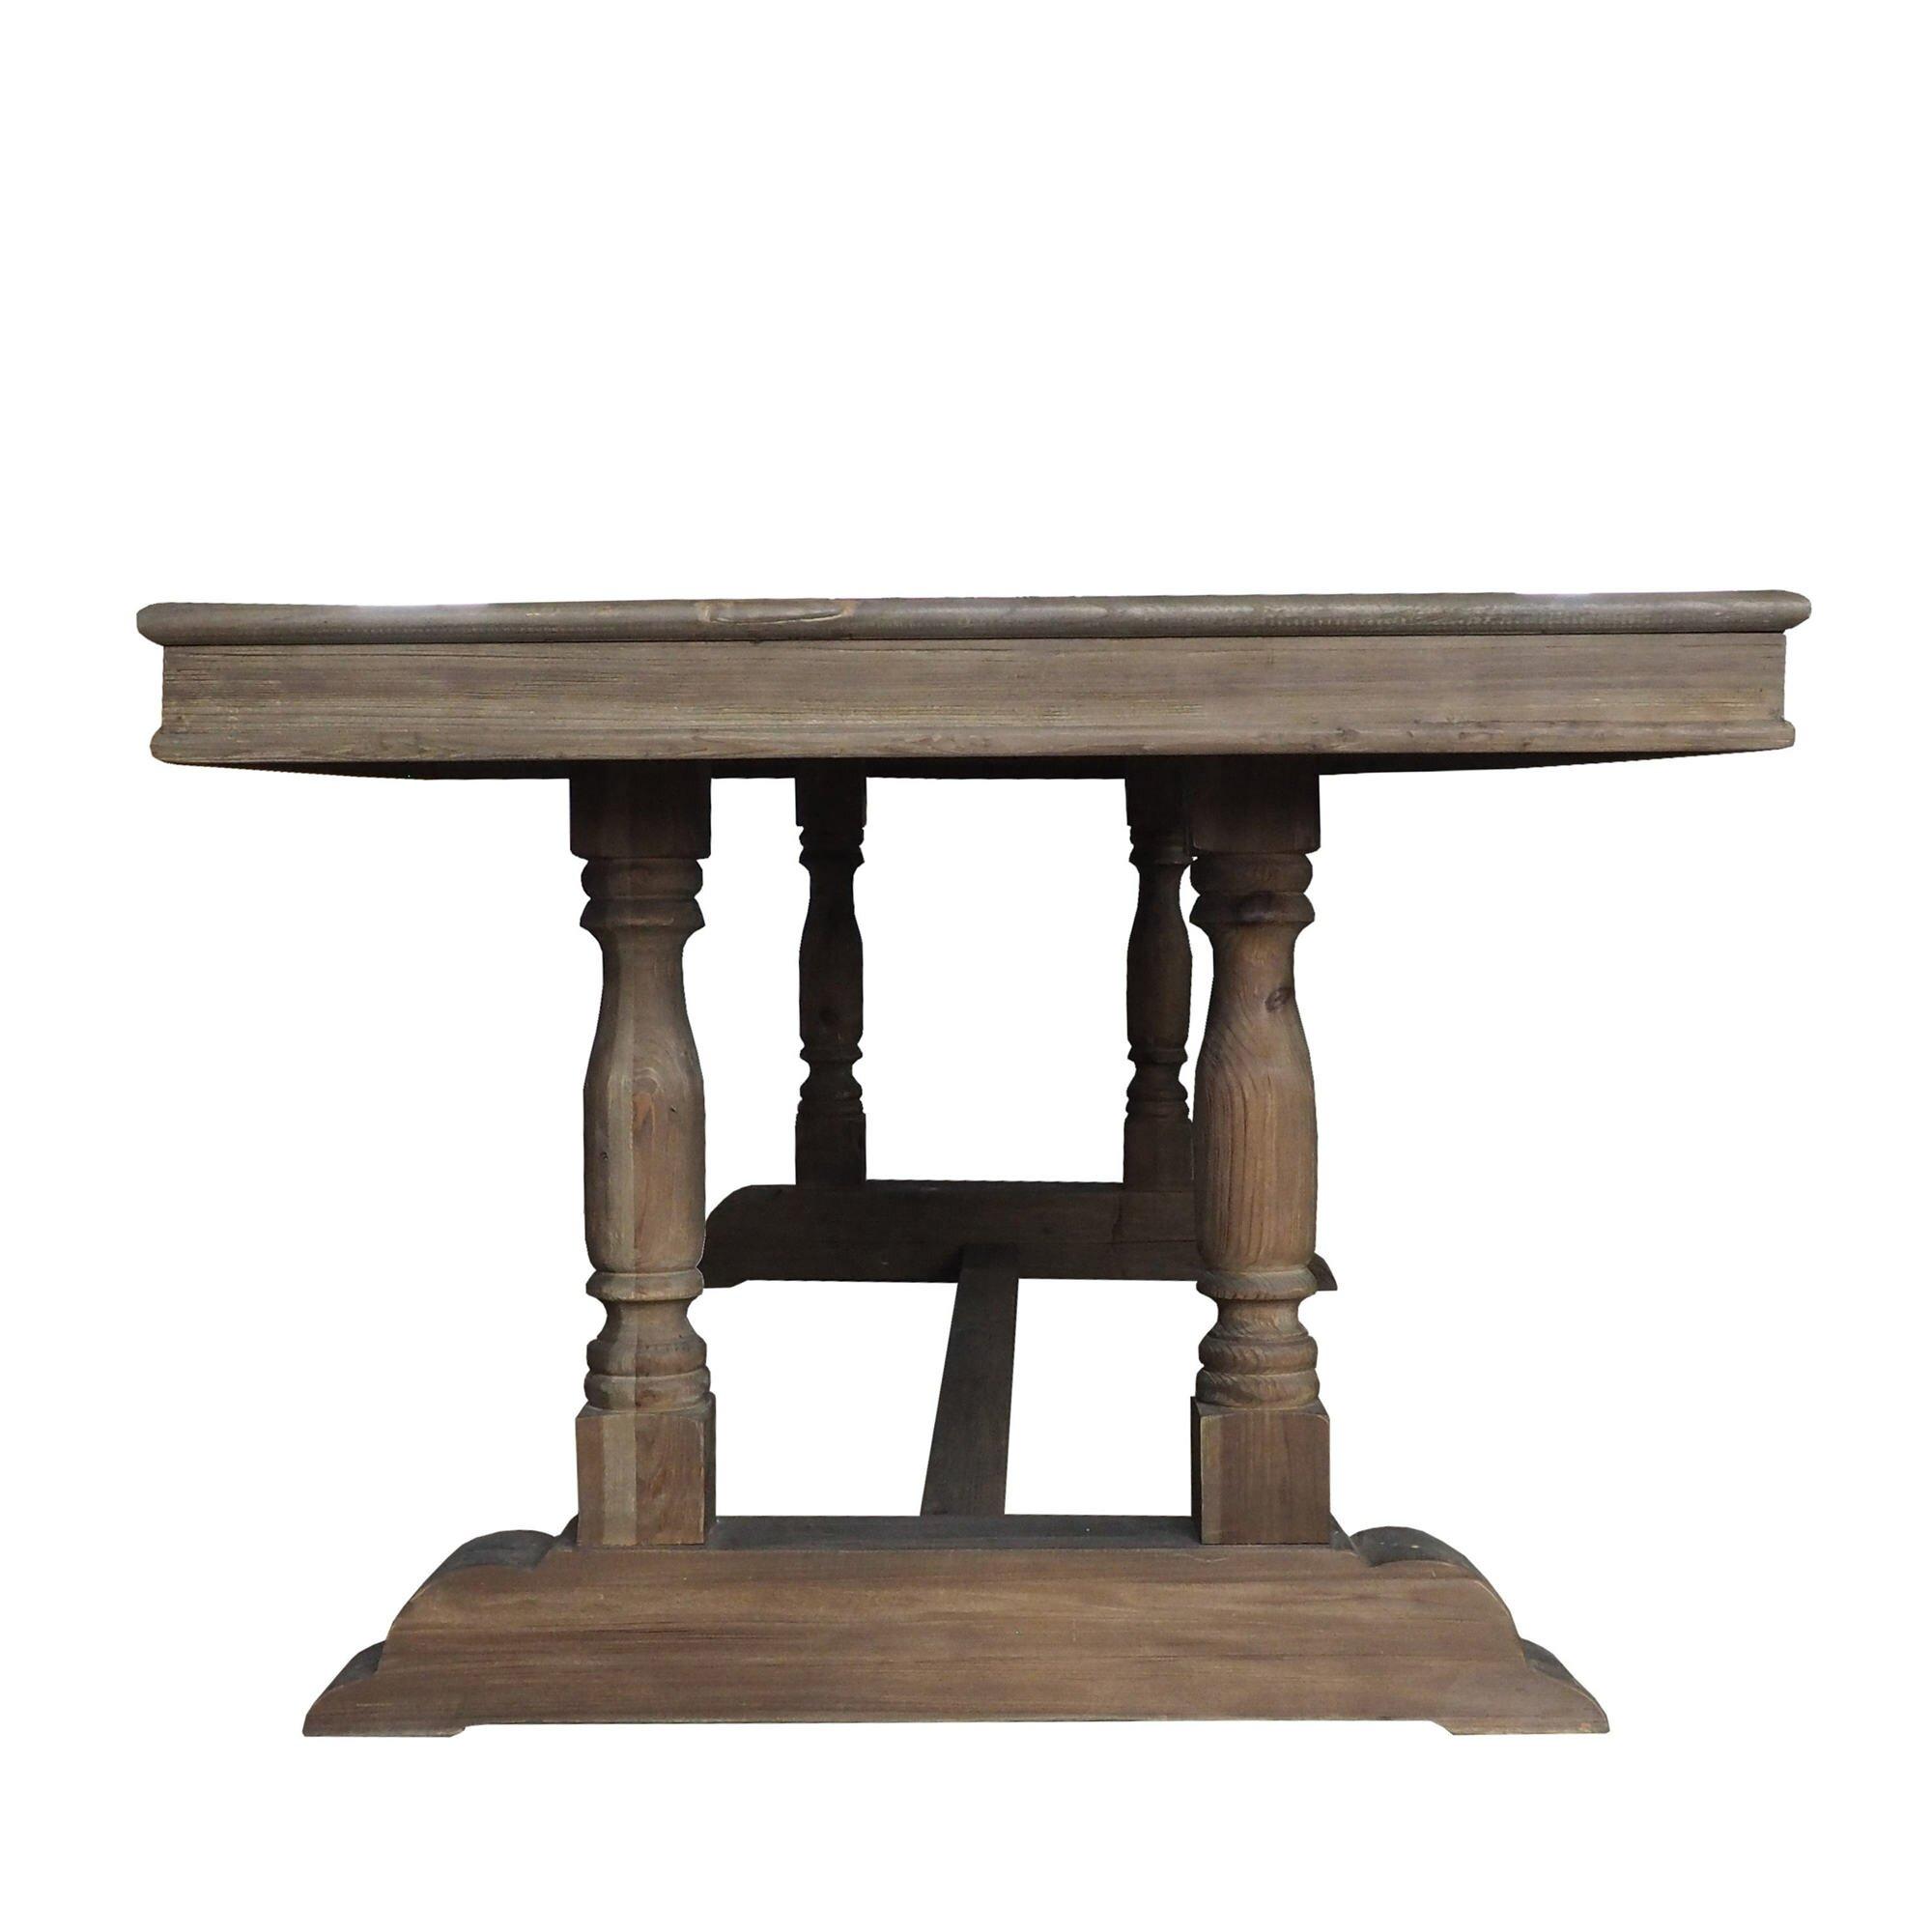 Moti furniture syracuse dining table wayfair for Wayfair furniture dining tables